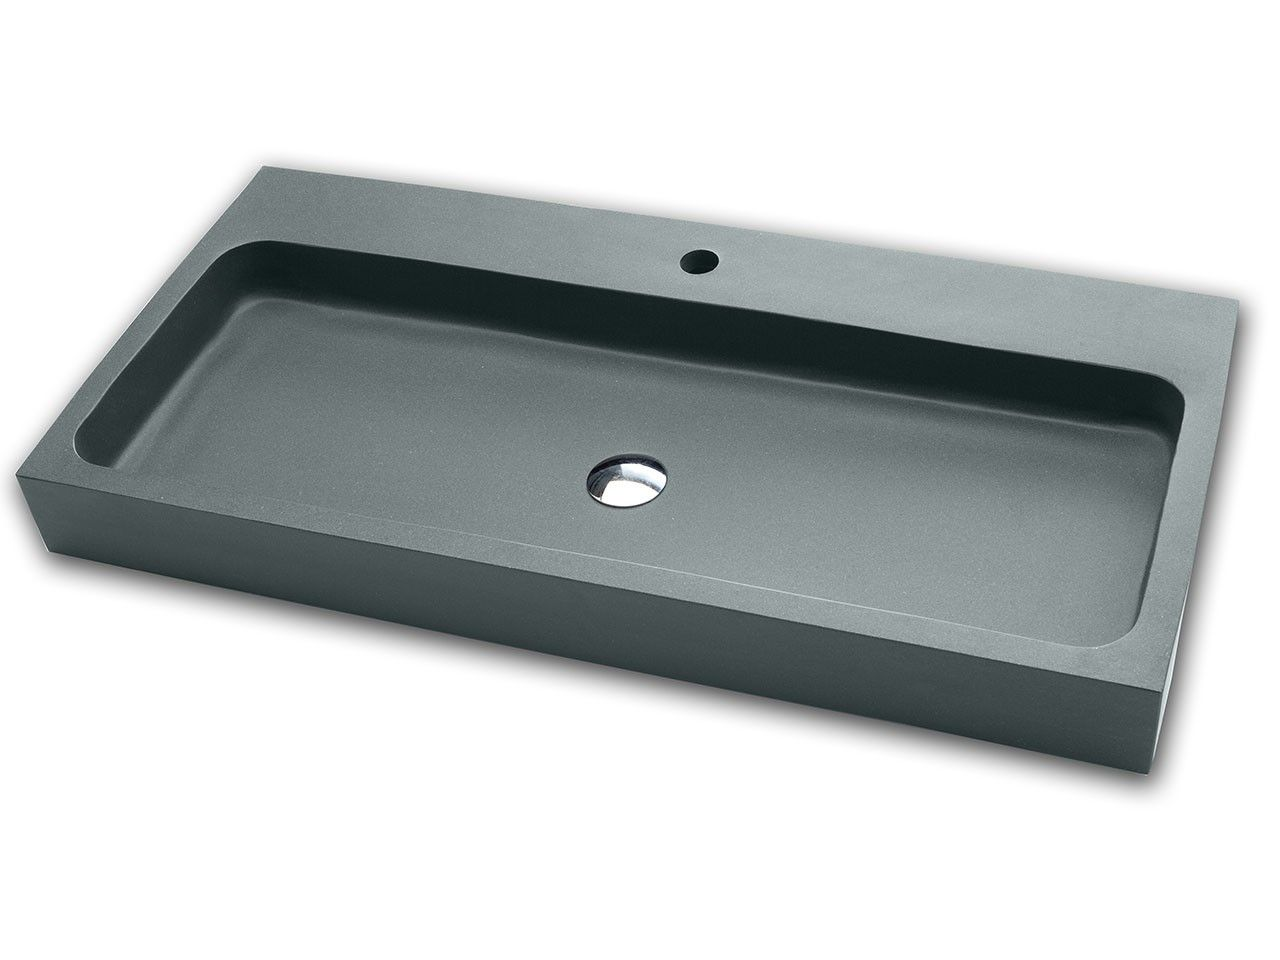 Arredamento grigio ~ Lavabo d arredo ponza resina grigio iperceramica lavabi